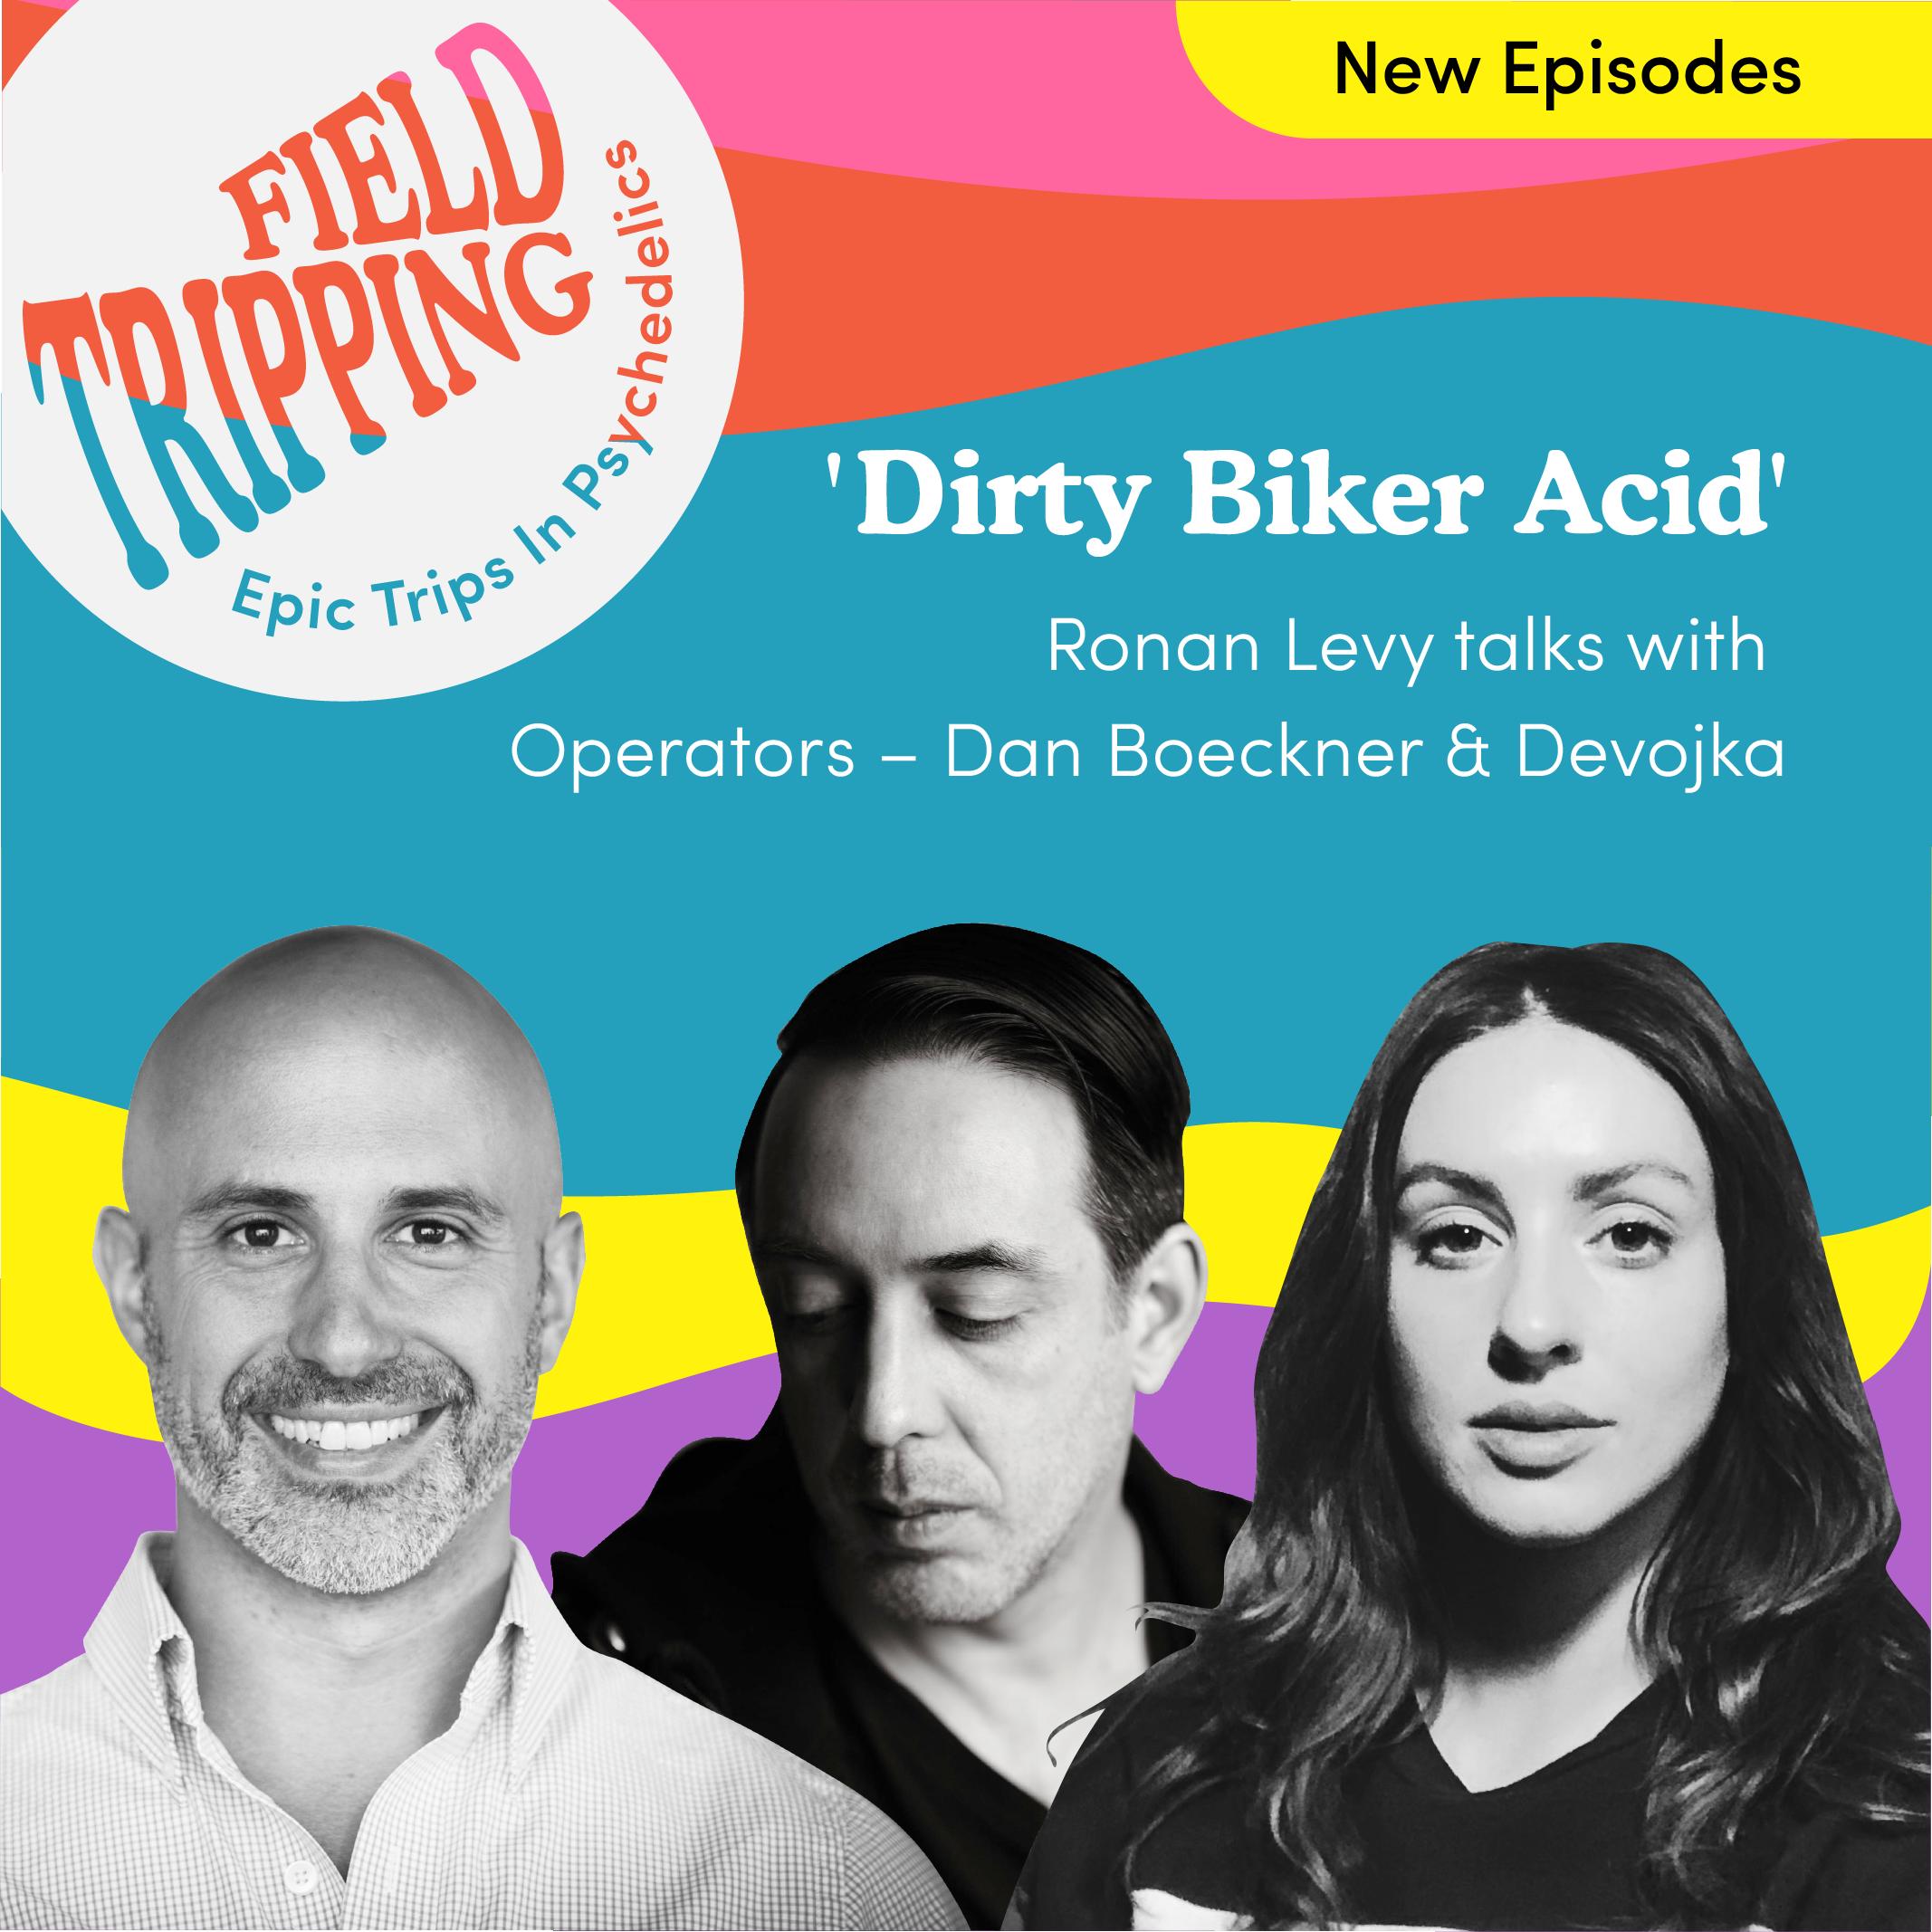 #11 Dirty Biker Acid   Operators - Dan Boeckner and Devojka